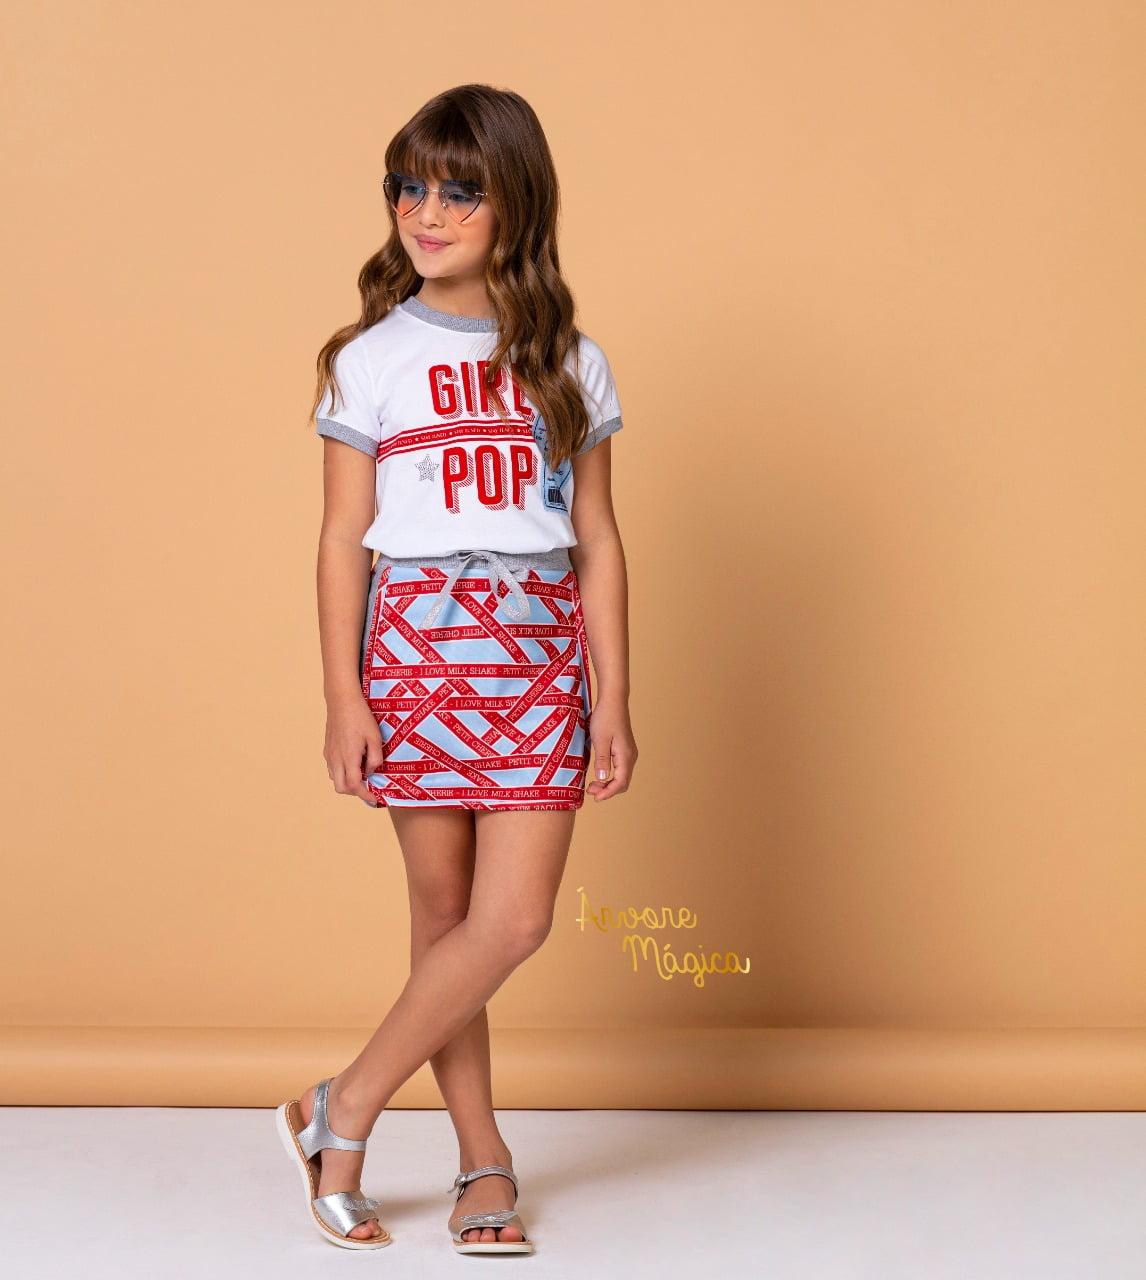 Conjunto Infantil Pop Girl Petit Cherie